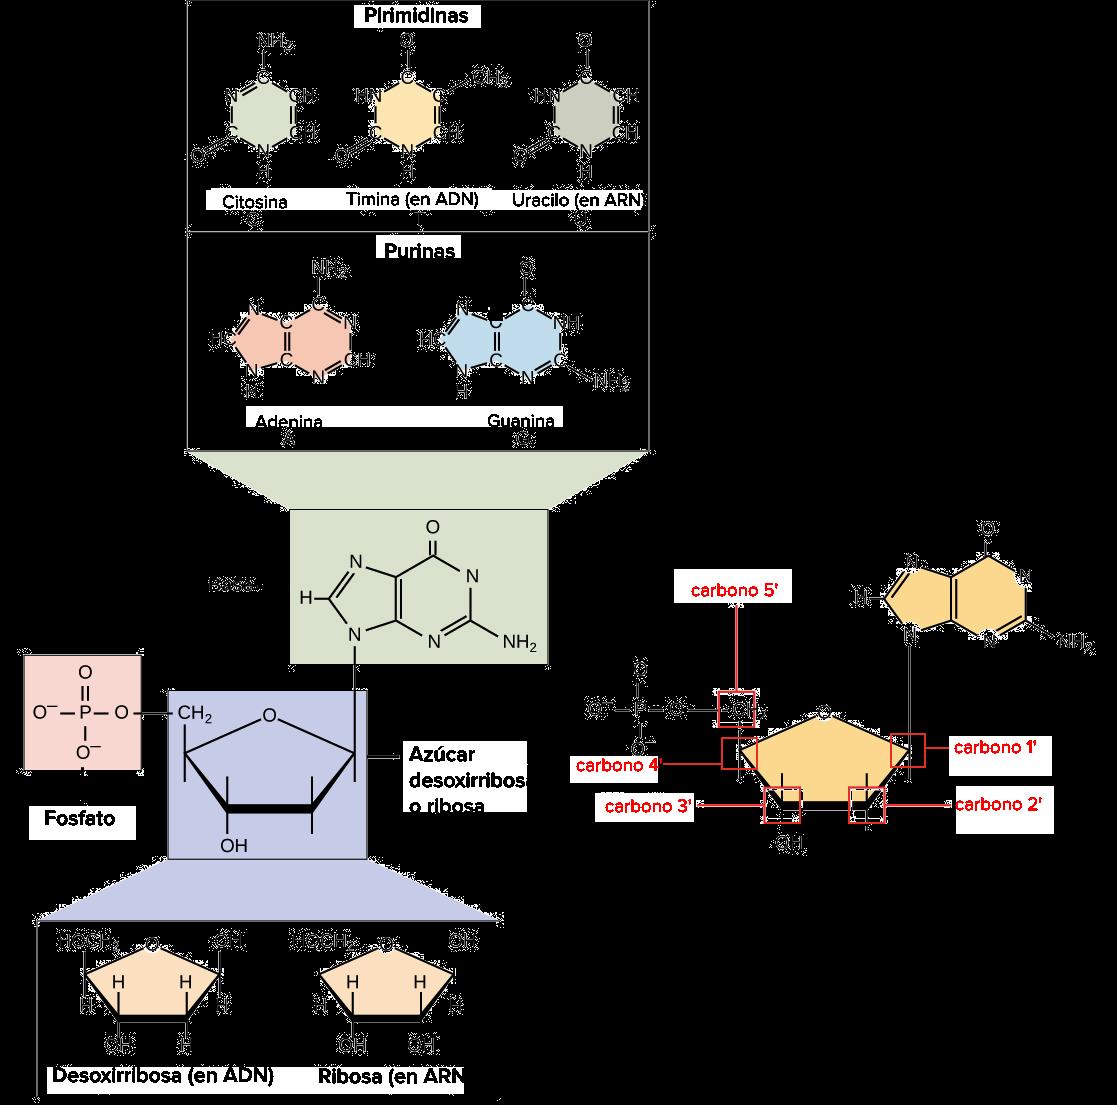 ácidos Nucleicos Artículo Khan Academy